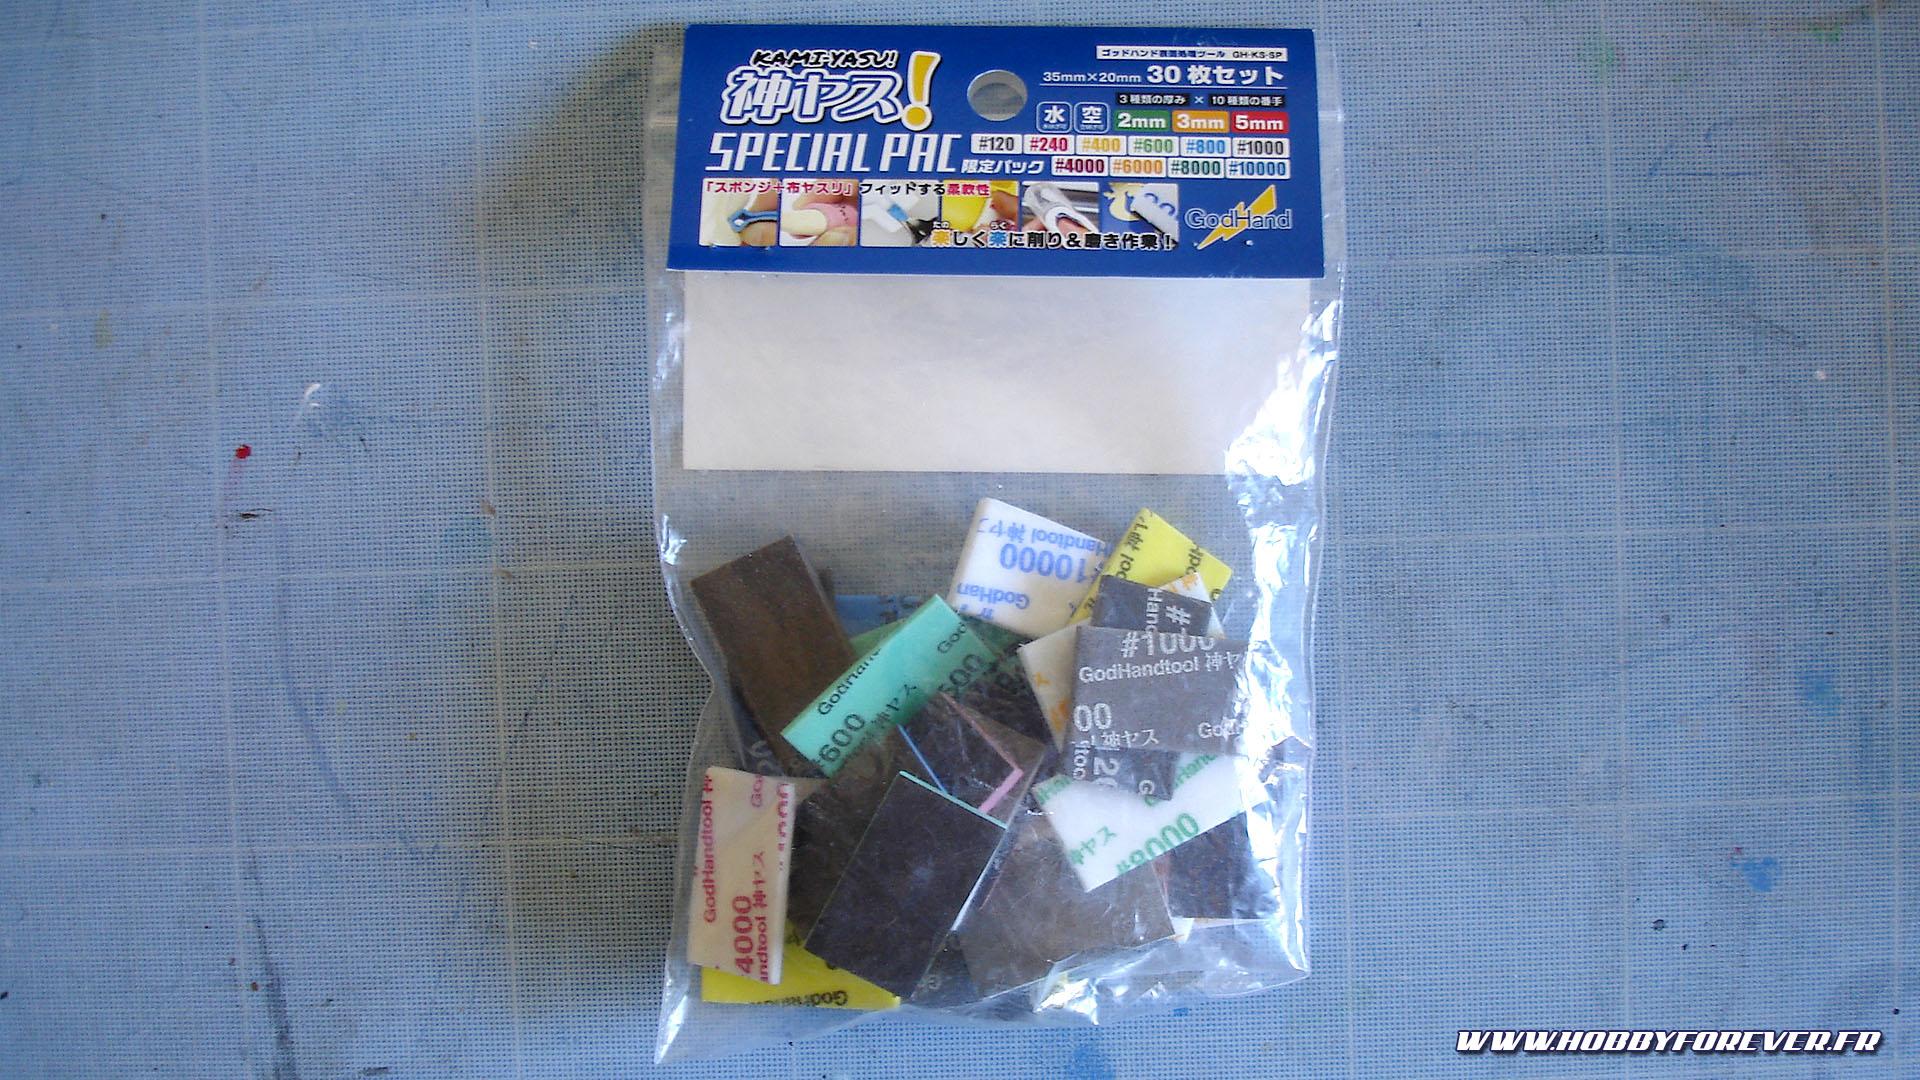 "Review - Les éponges abrasives GodHand ""Kami-Yasu! Sponge cloth file Special Pack"""